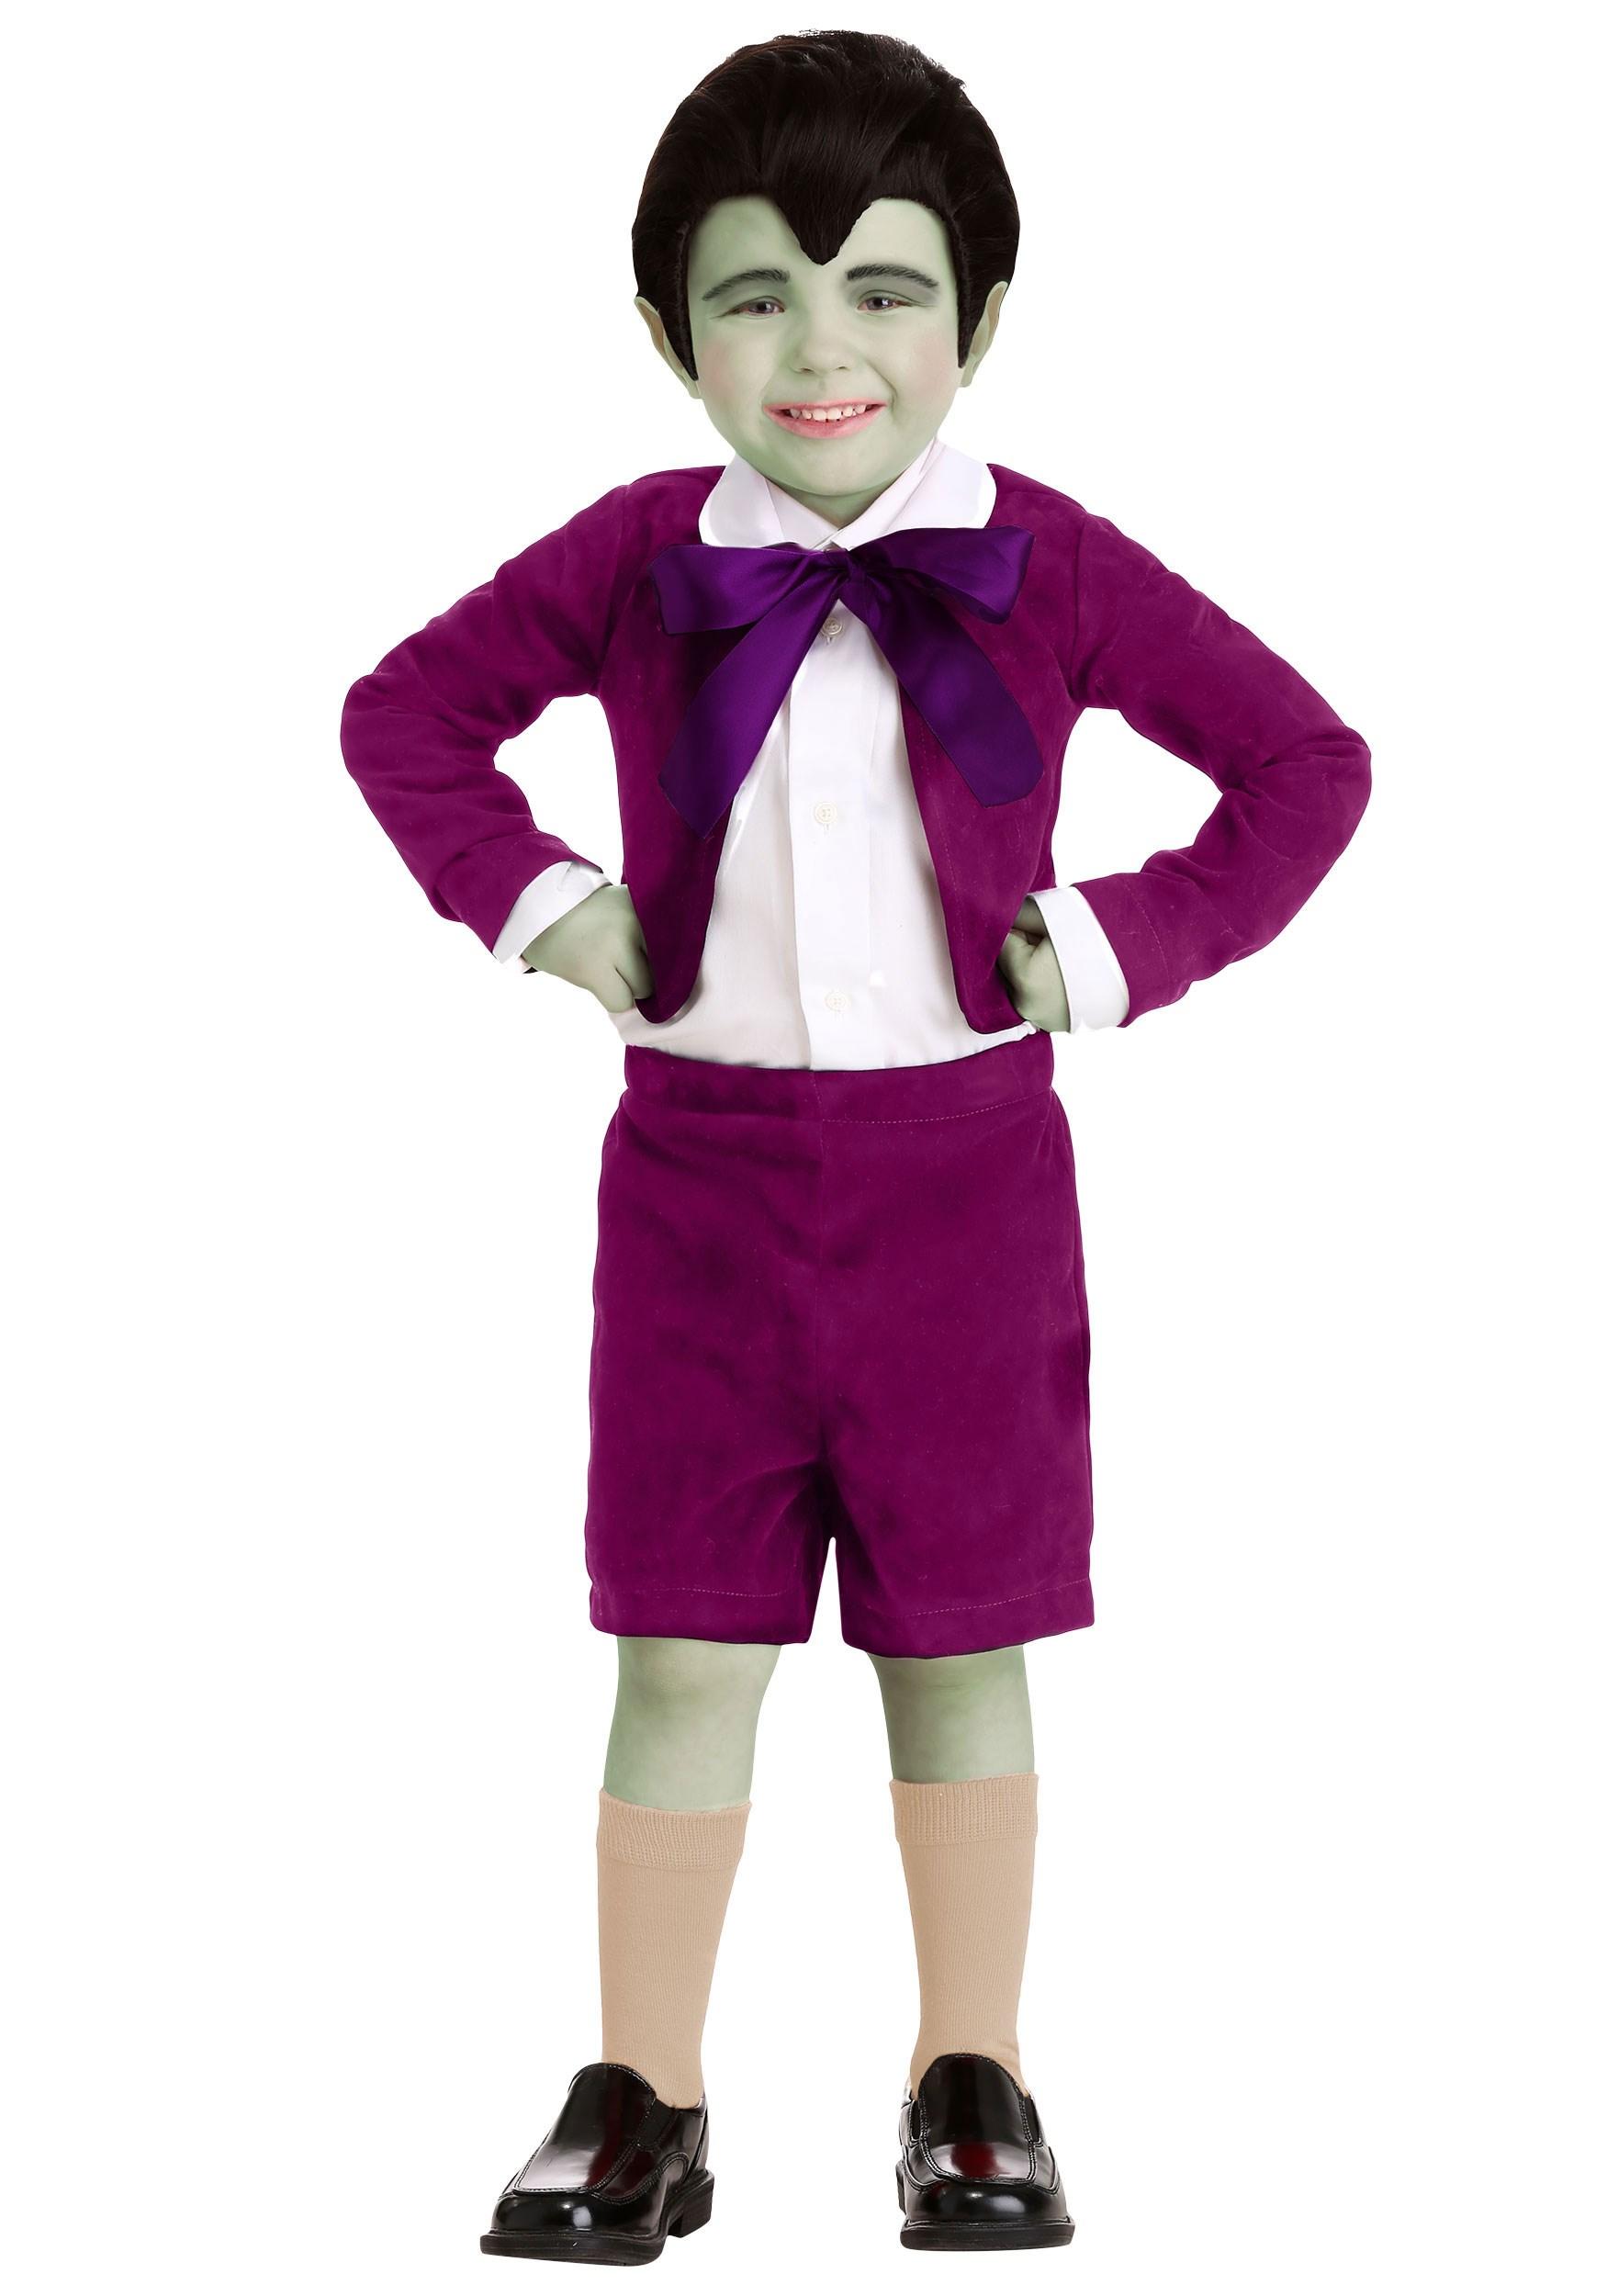 Toddler Munsters Eddie Munster Costume